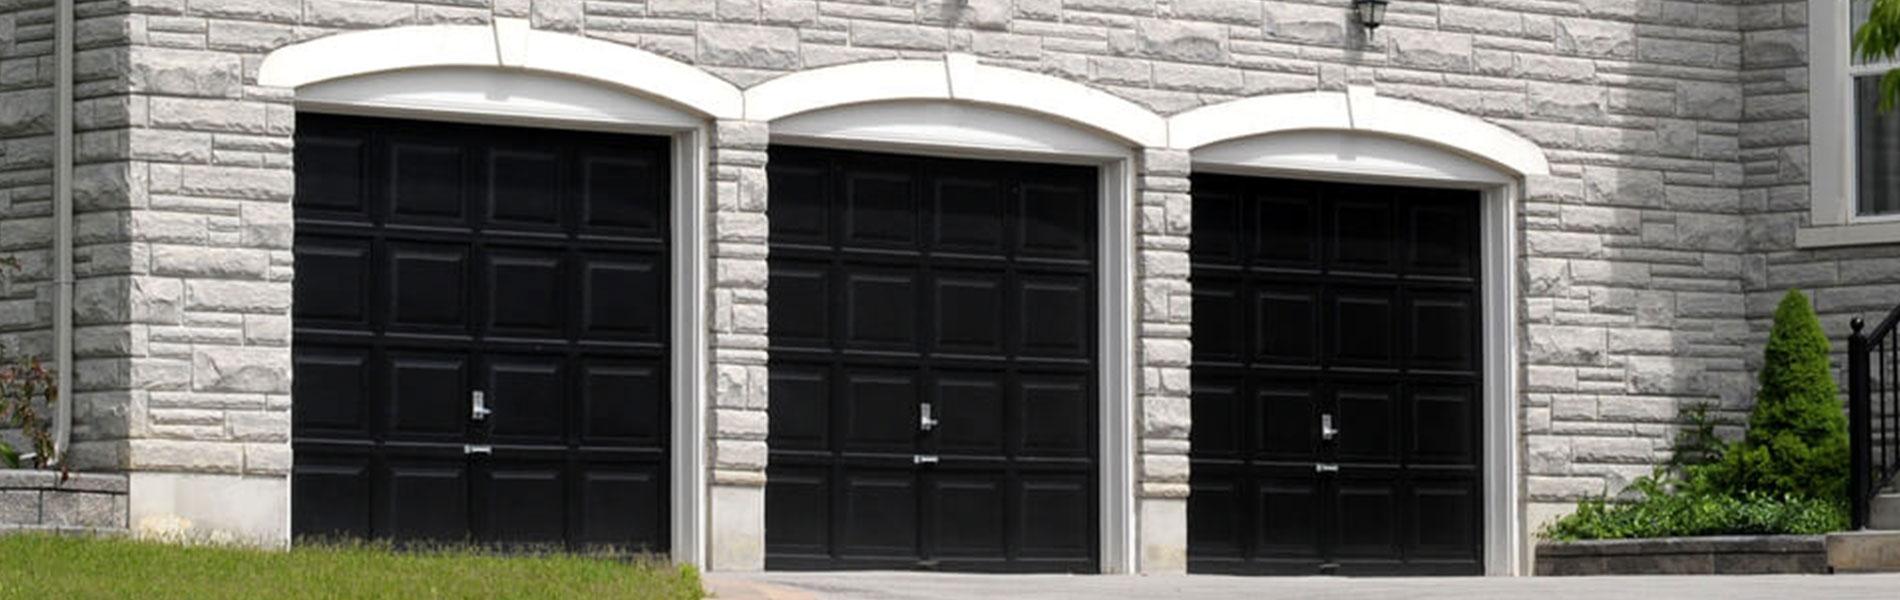 ngd garage charlotte neighborhood nc slider with in services b door